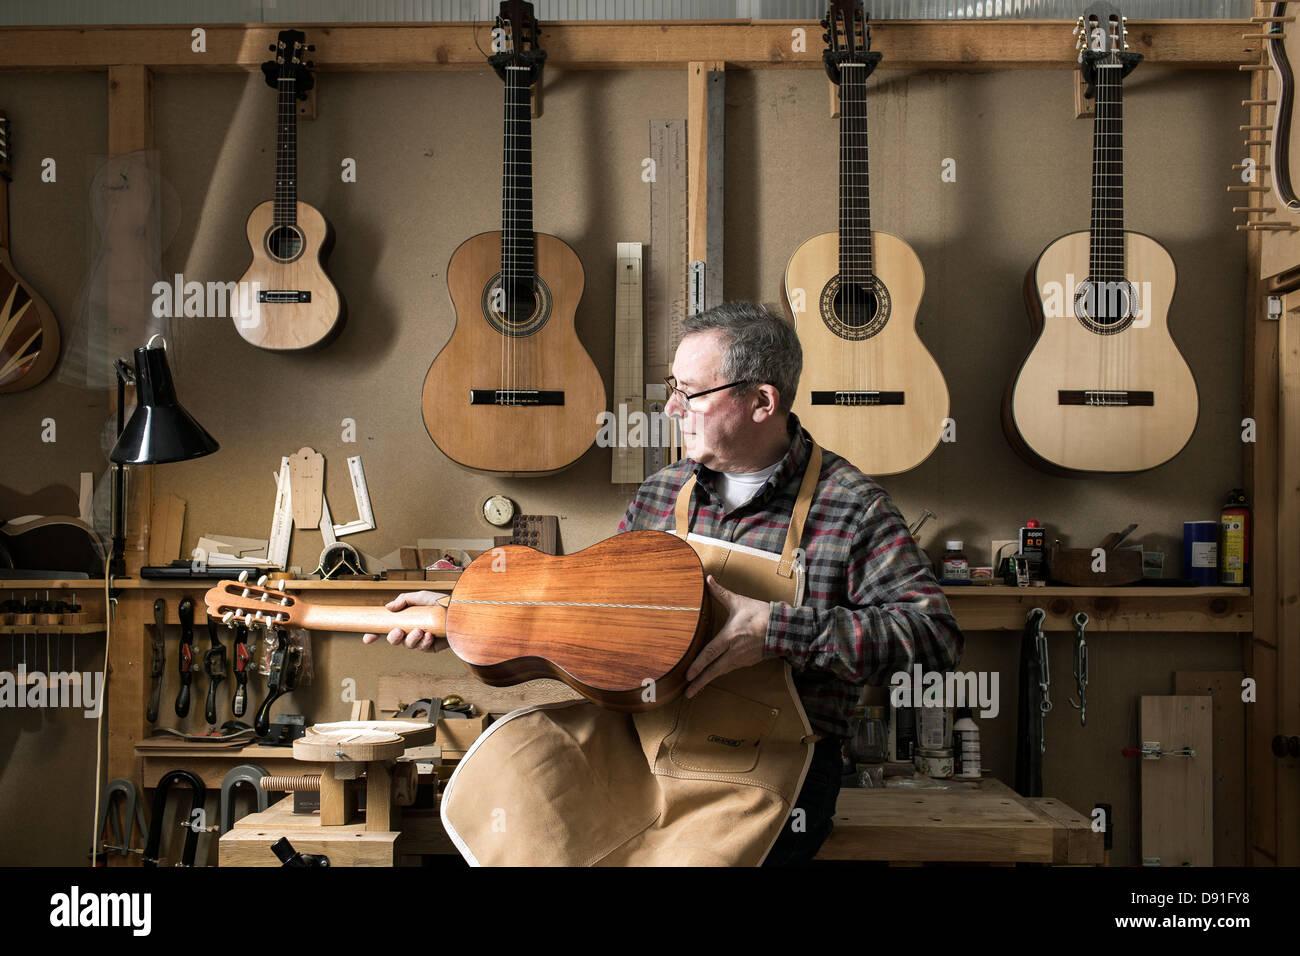 Creador de guitarra guitarra acústica en el taller de acabado Imagen De Stock